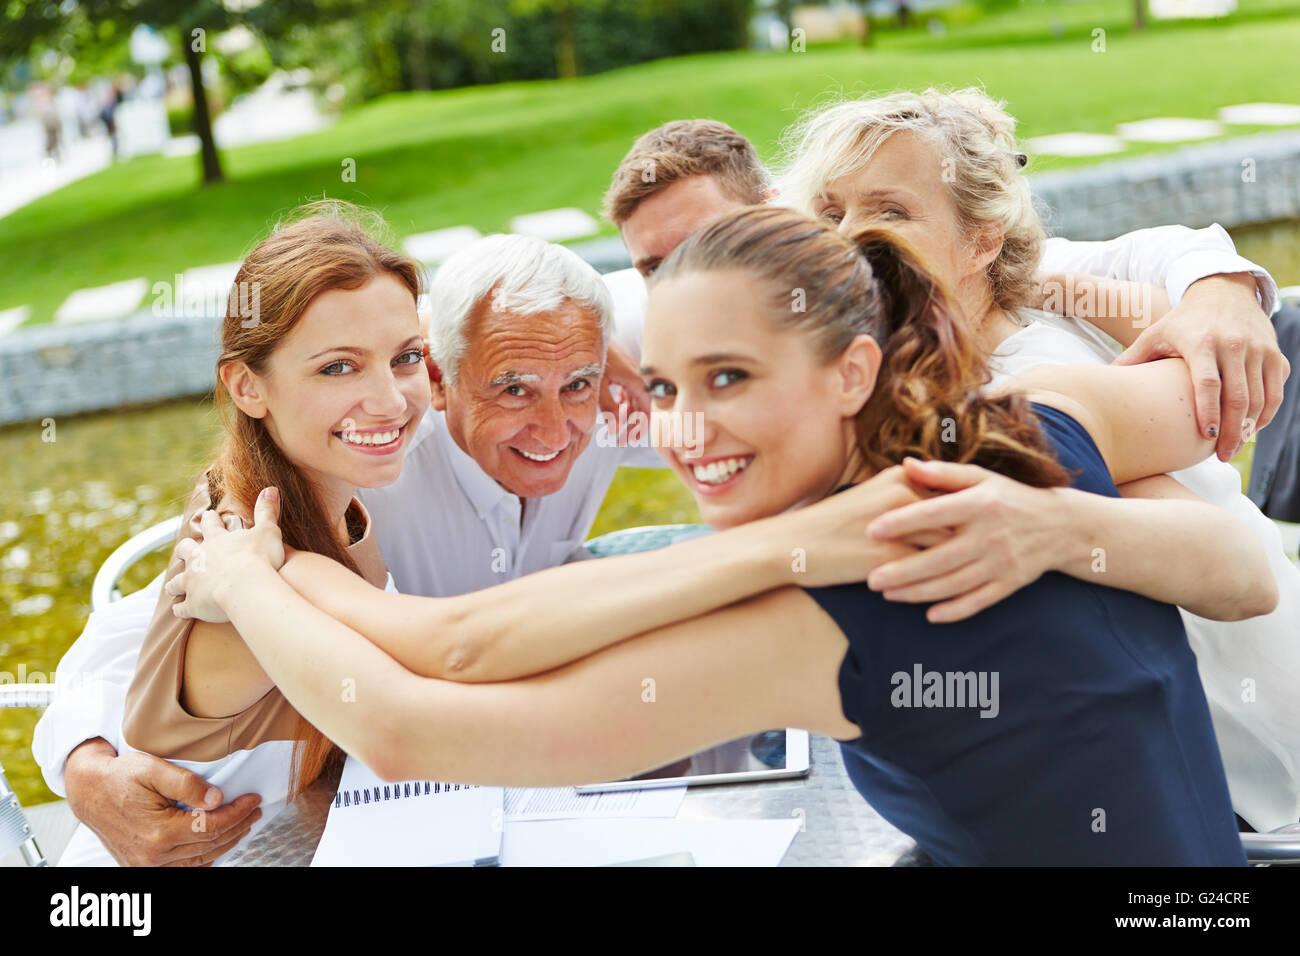 Grupo De Empresarios Abrazando A La Motivación En Un Equipo